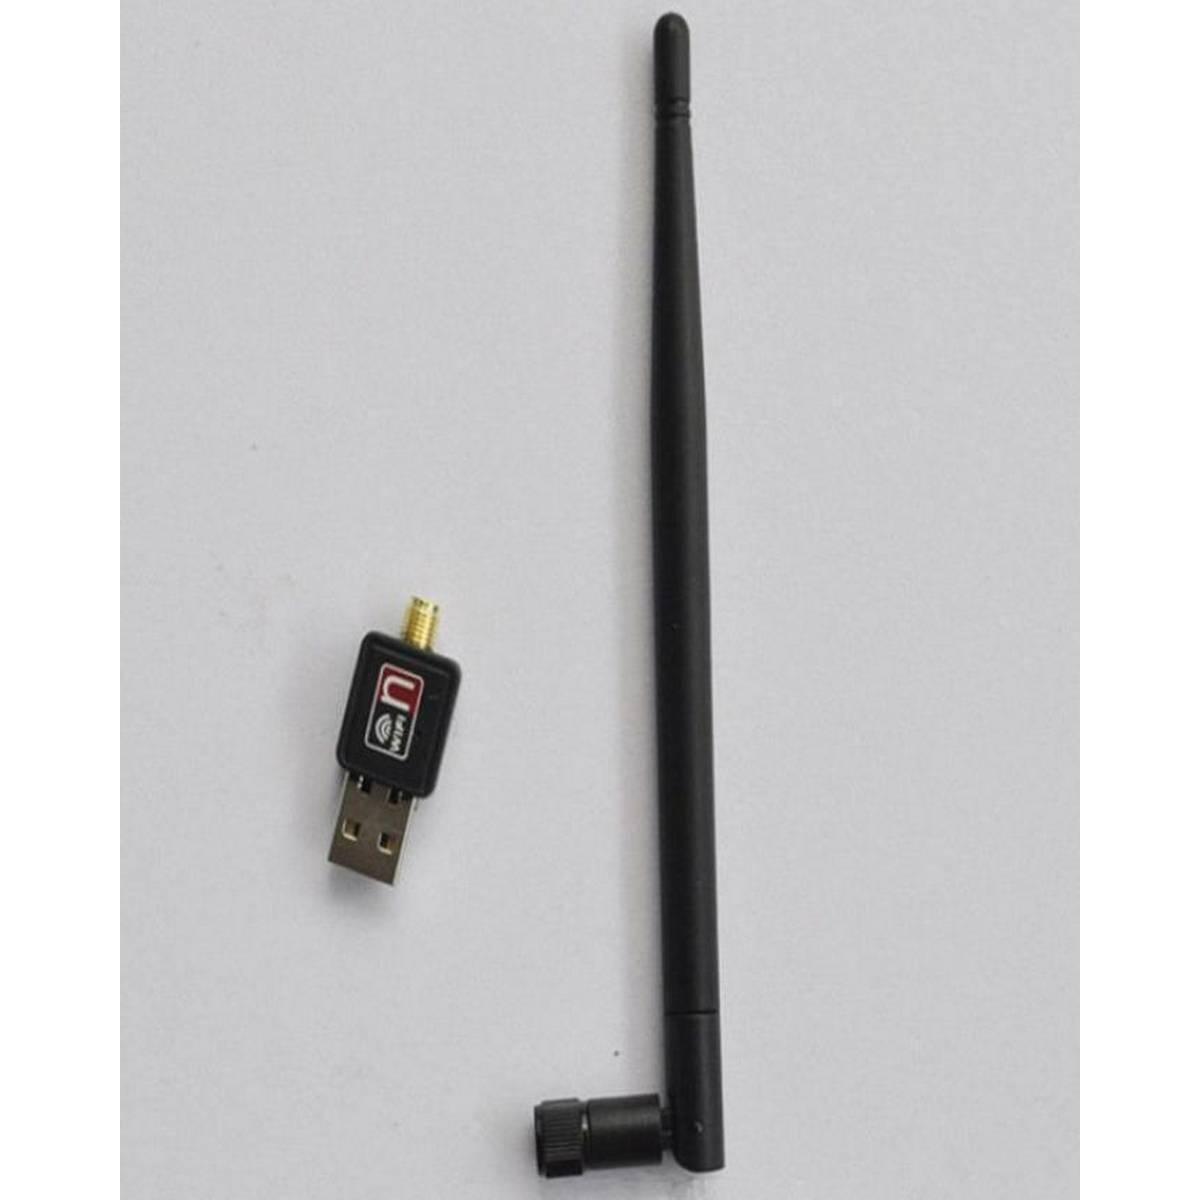 1000Mbps USB2.0 Wifi Wireless Network Adapter Dongle+Antenna 802.11n/g/b LAN Card